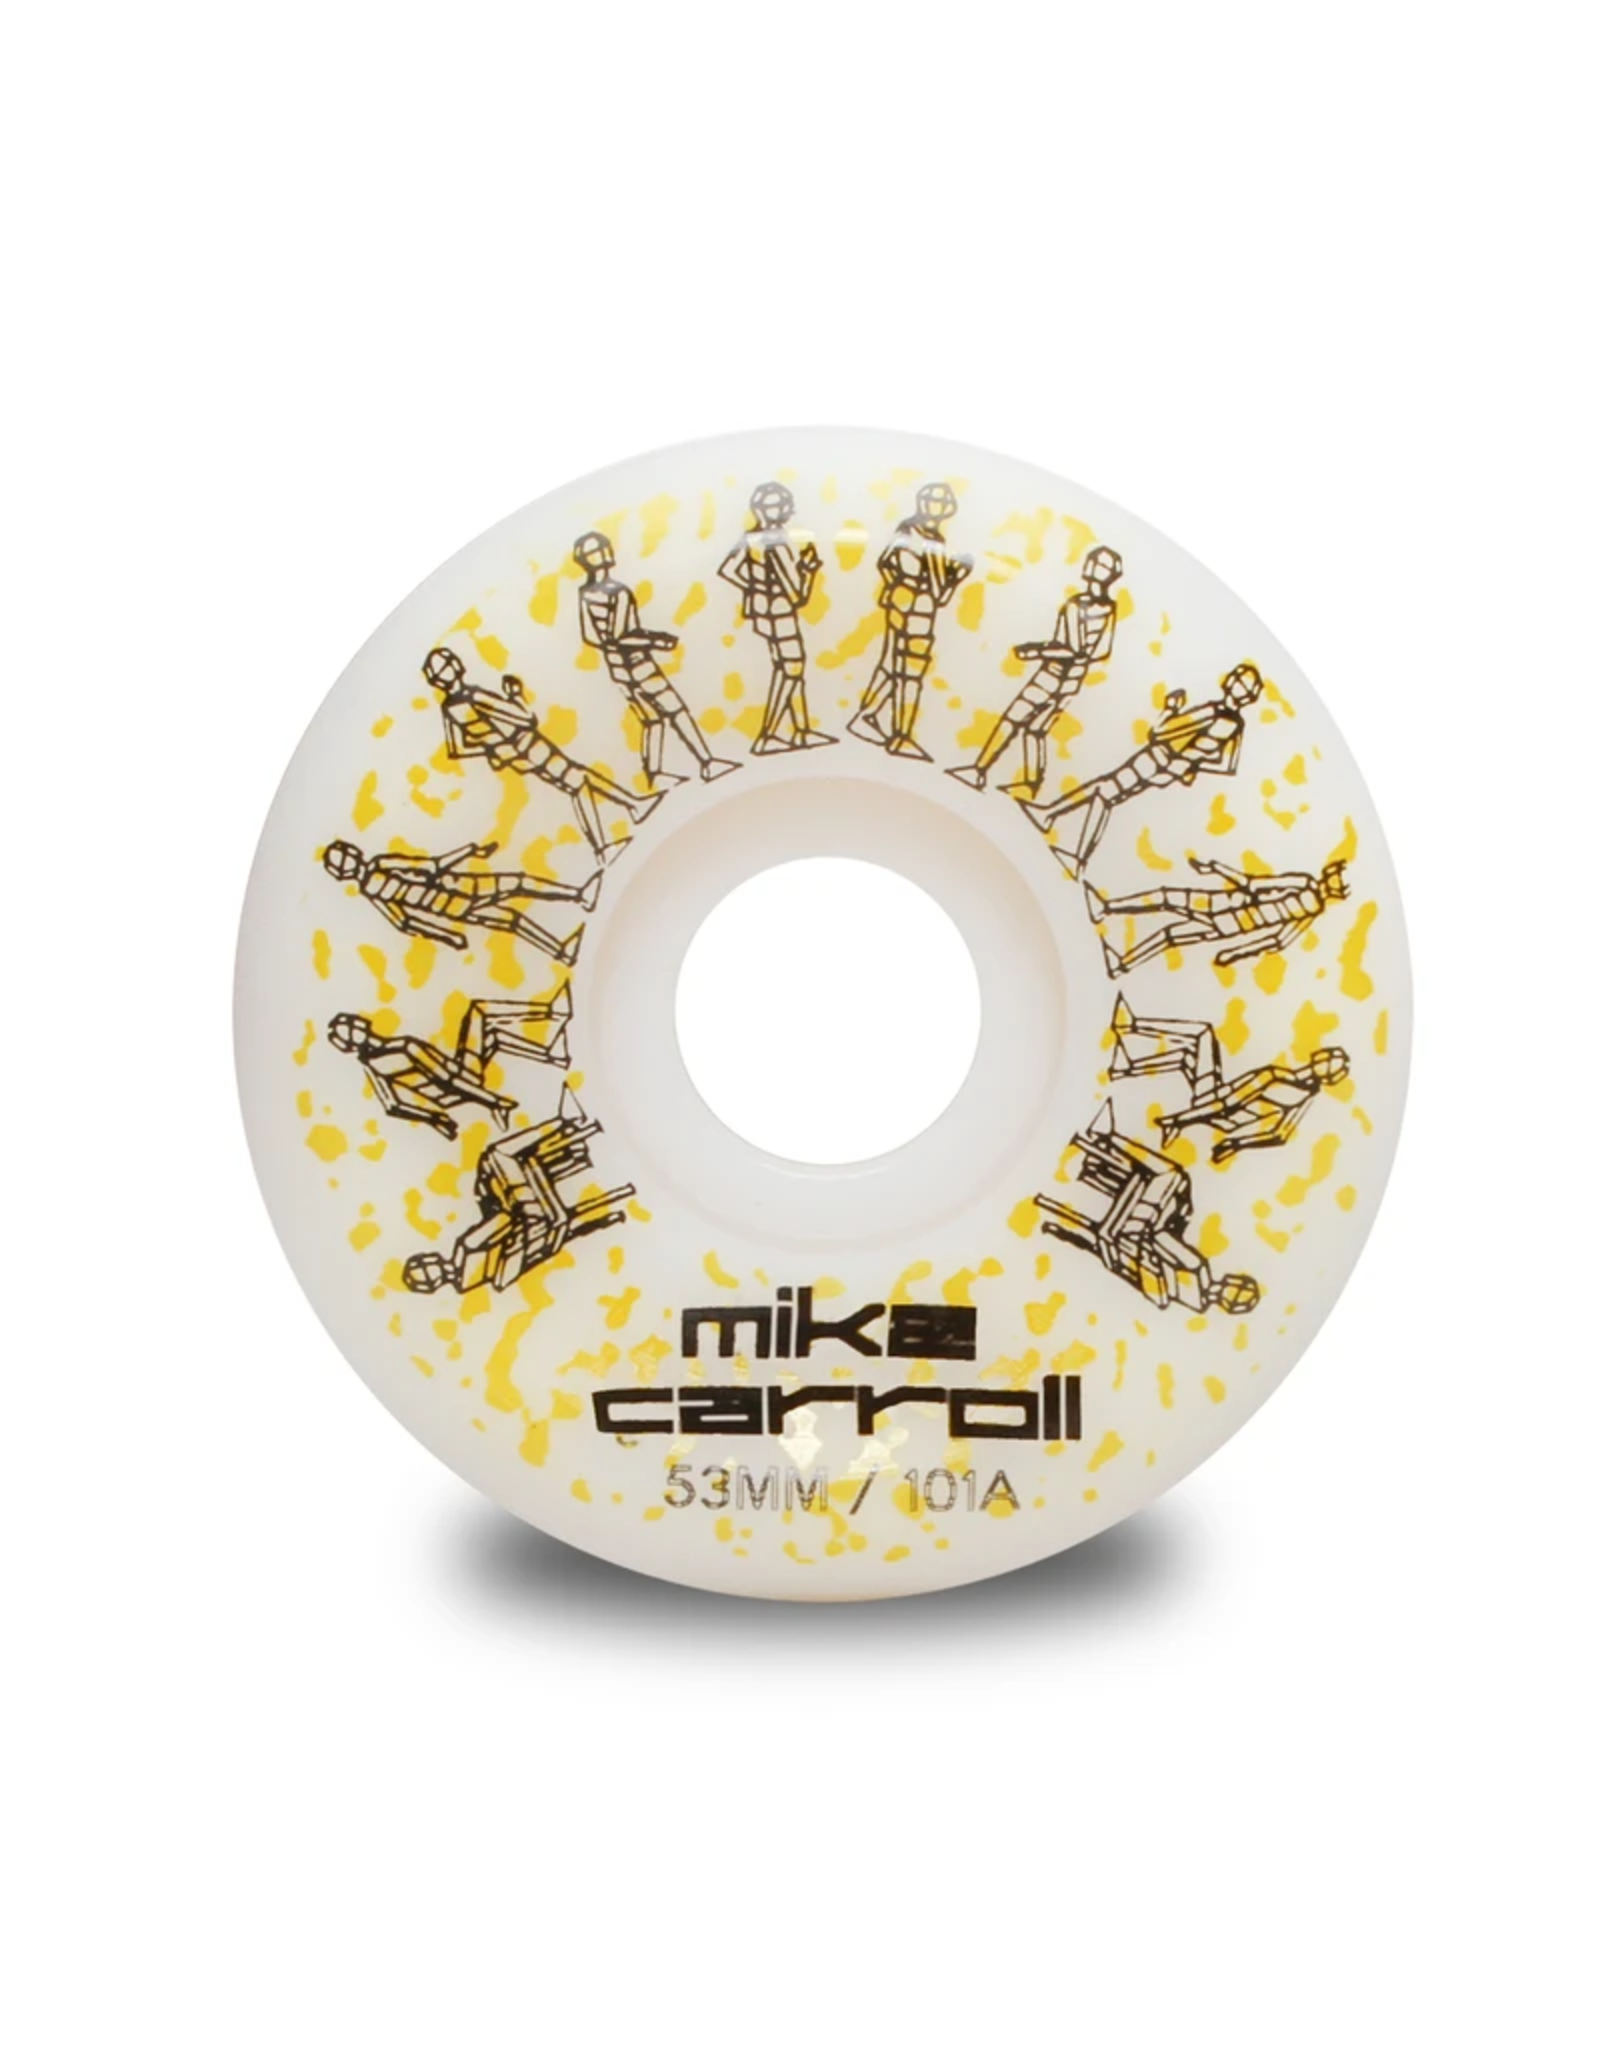 Wayward Wheels Wayward - Funnel Cut 101a - Mike Carroll PRO 53mm